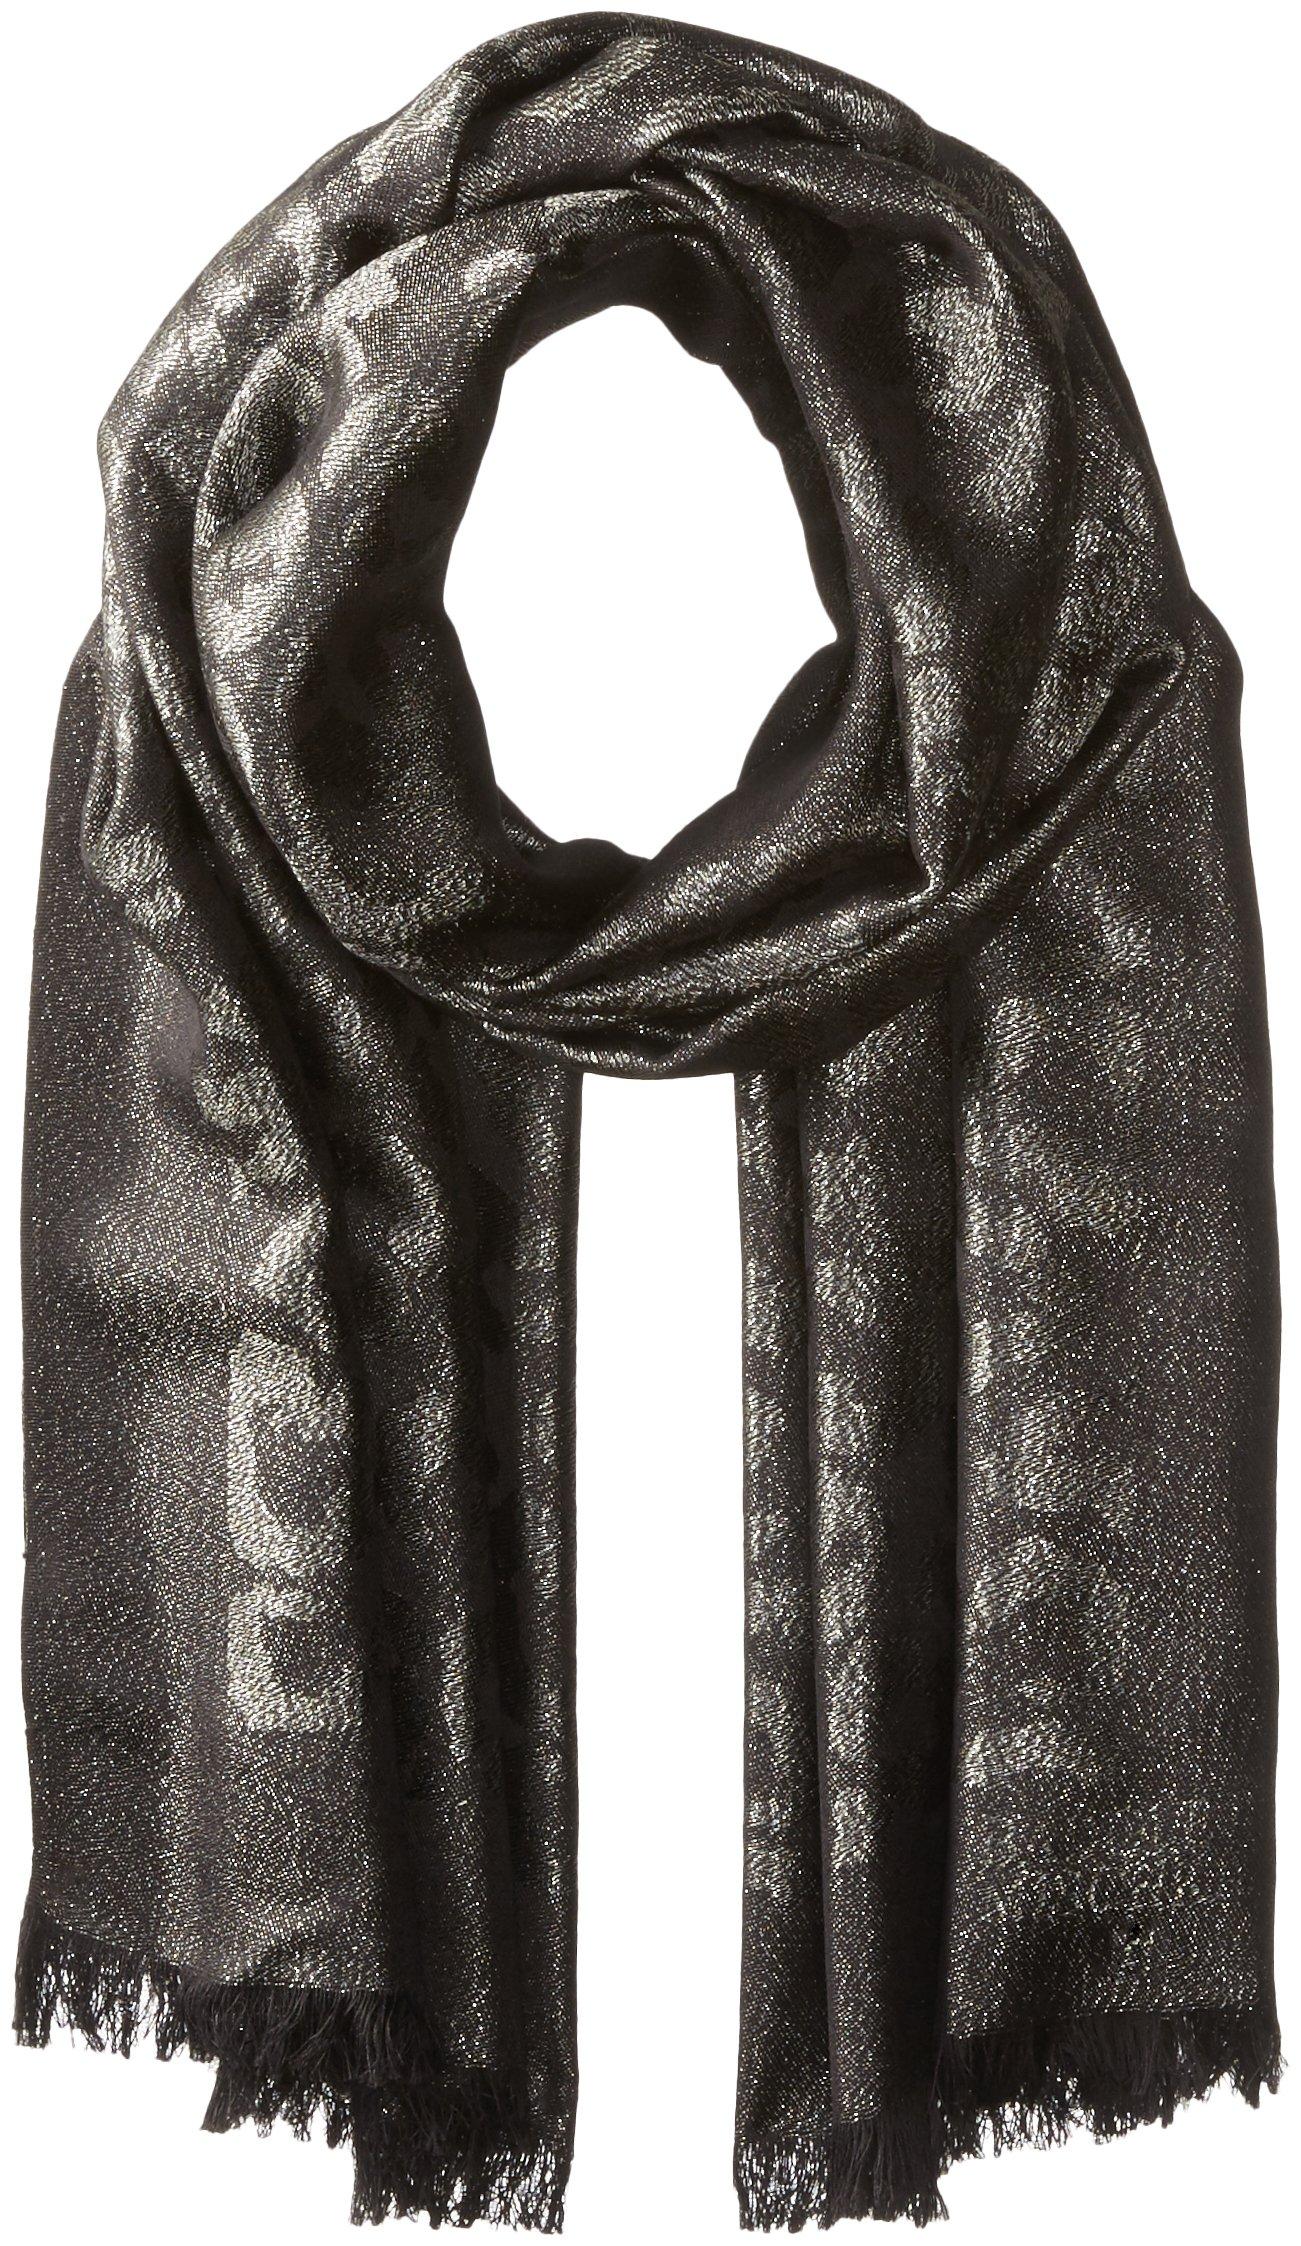 Badgley Mischka Women's Ocelot Lurex Jacquard Wrap Scarf, black/silver, One Size